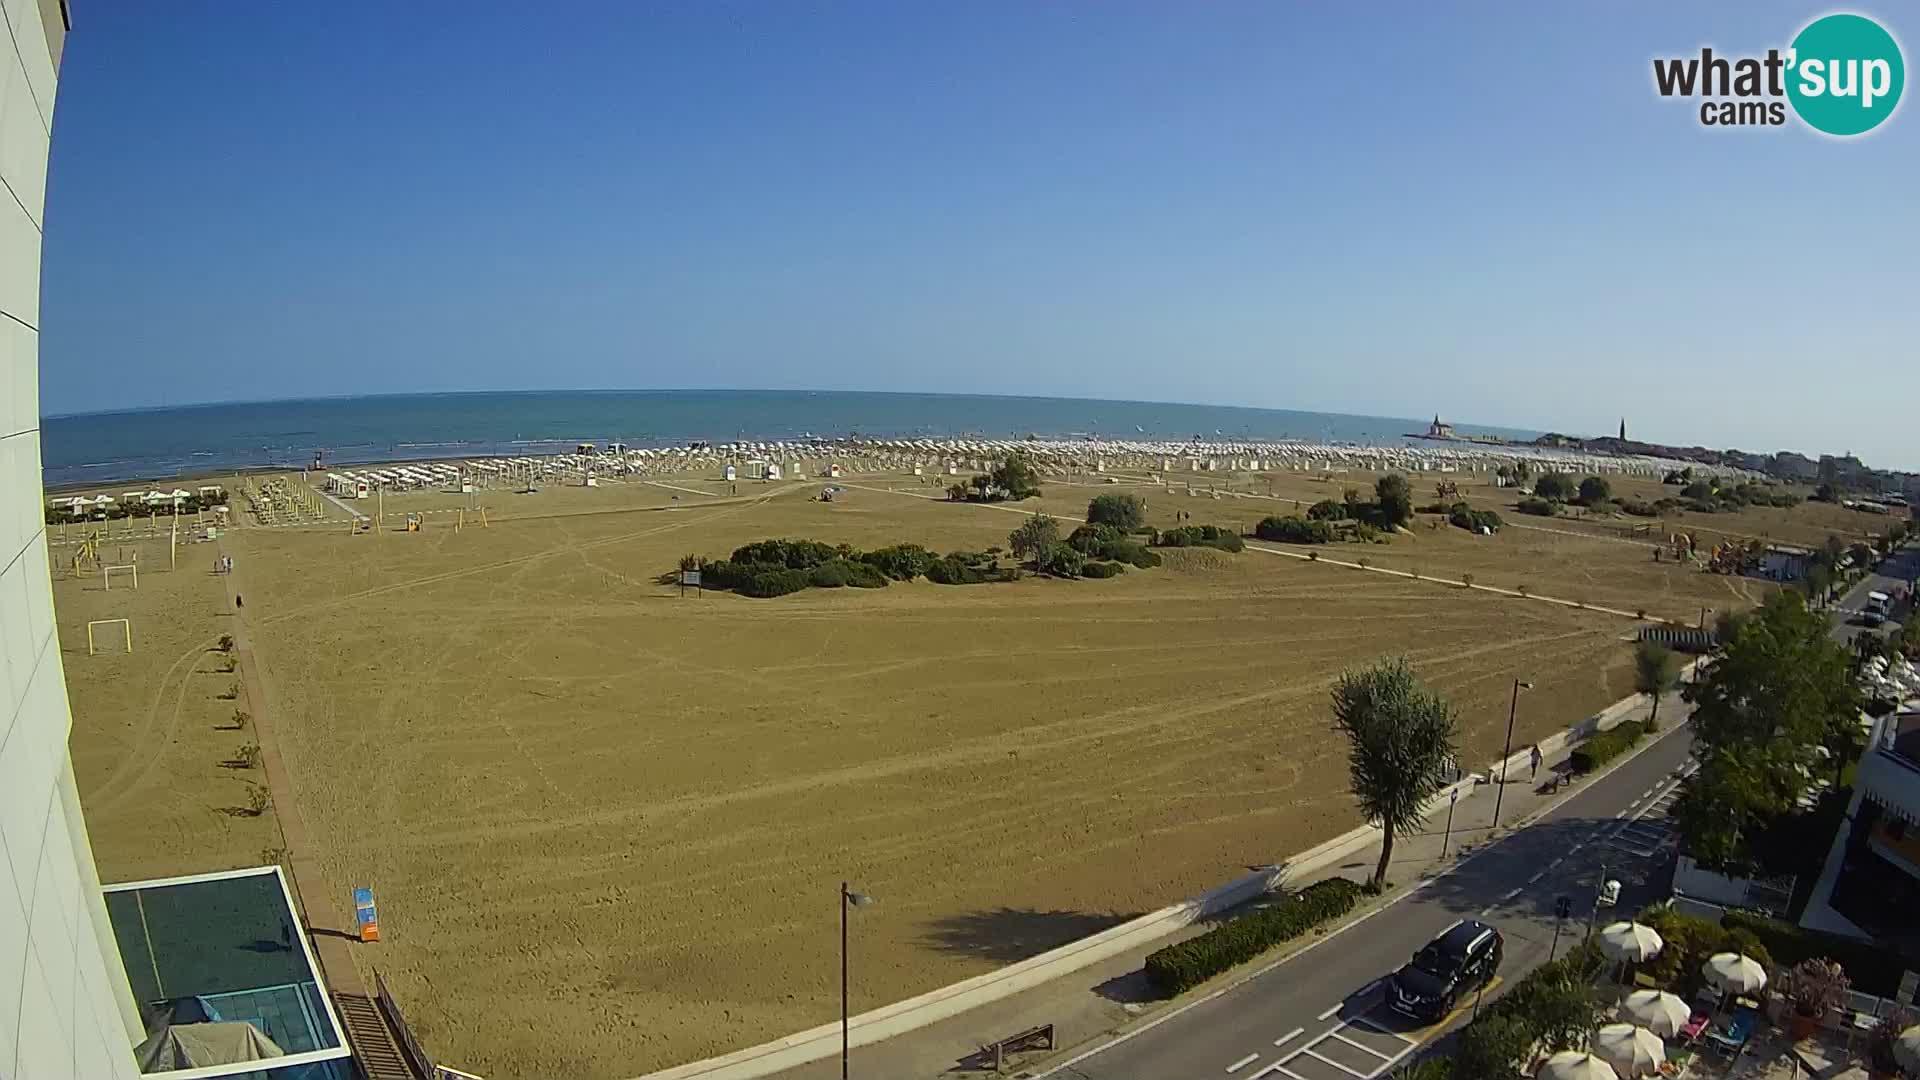 Hotel Panoramic dal vivo Caorle spiaggia Levante webcam